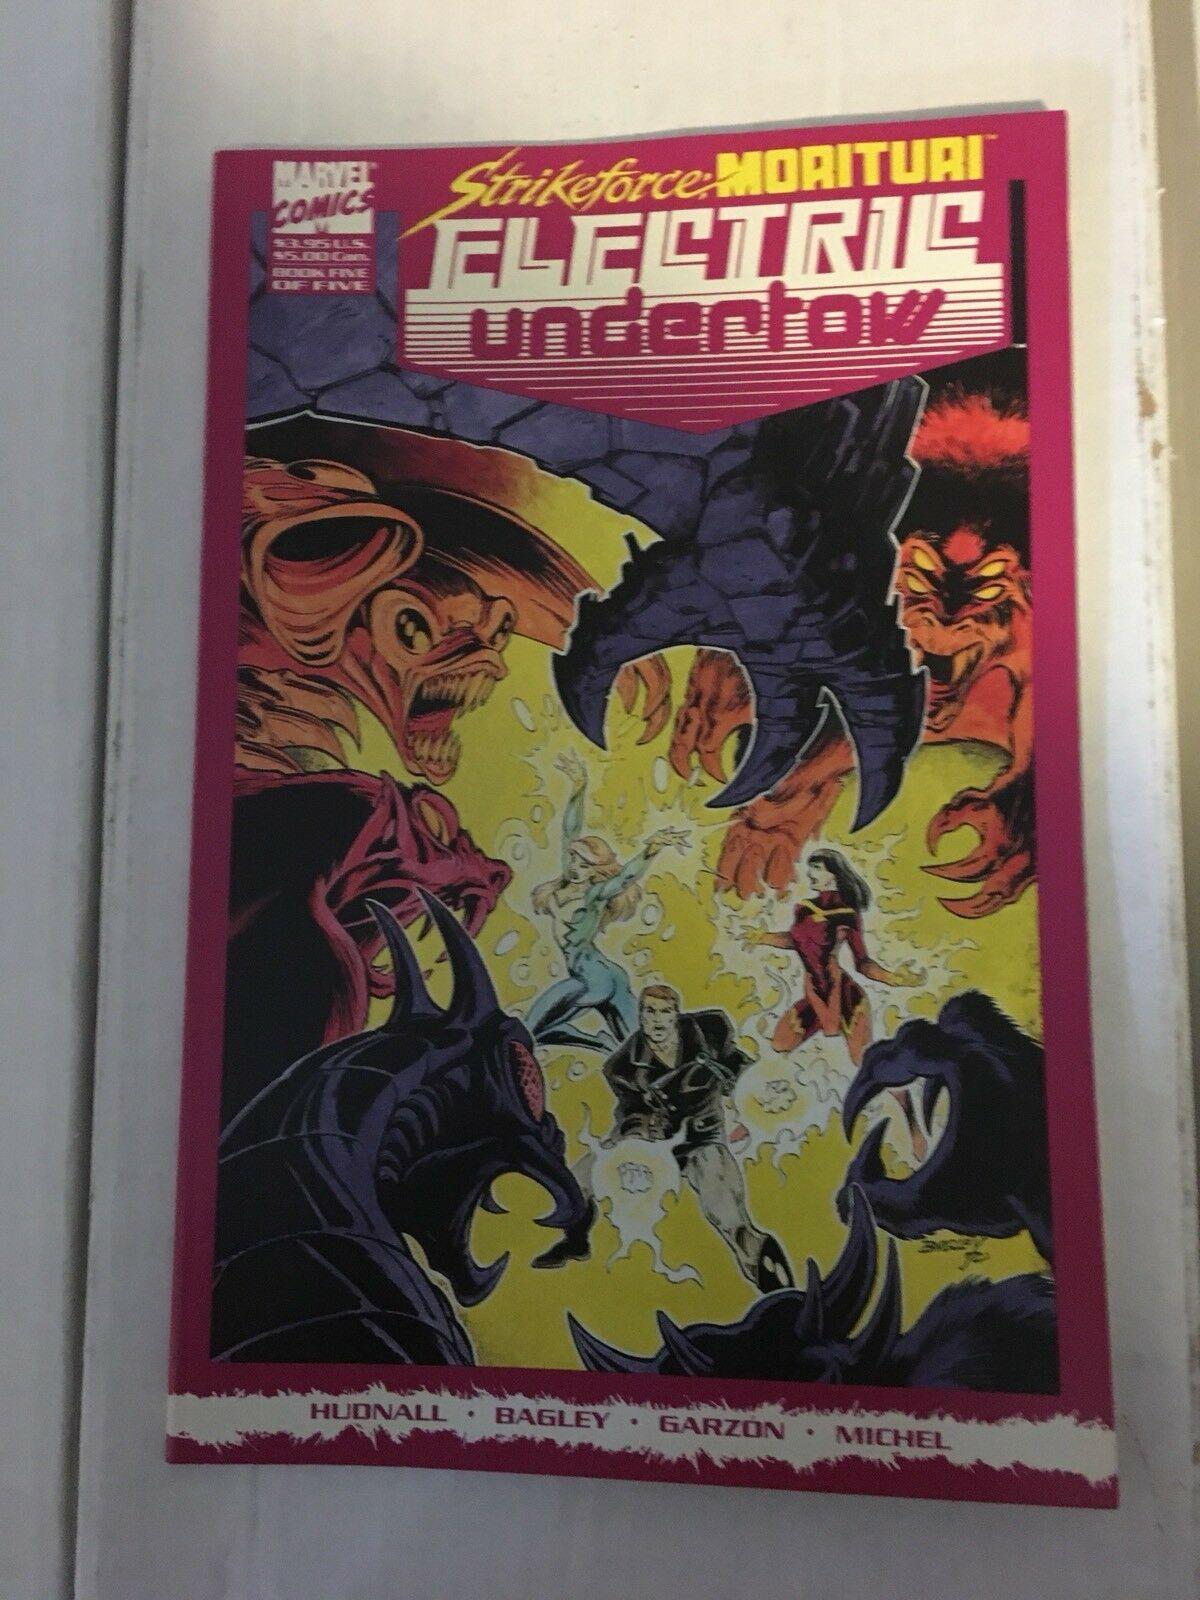 Strikeforce Morituri Electric Underflow #1 - 5 Marvel Comic Book Set 1989-90 NM